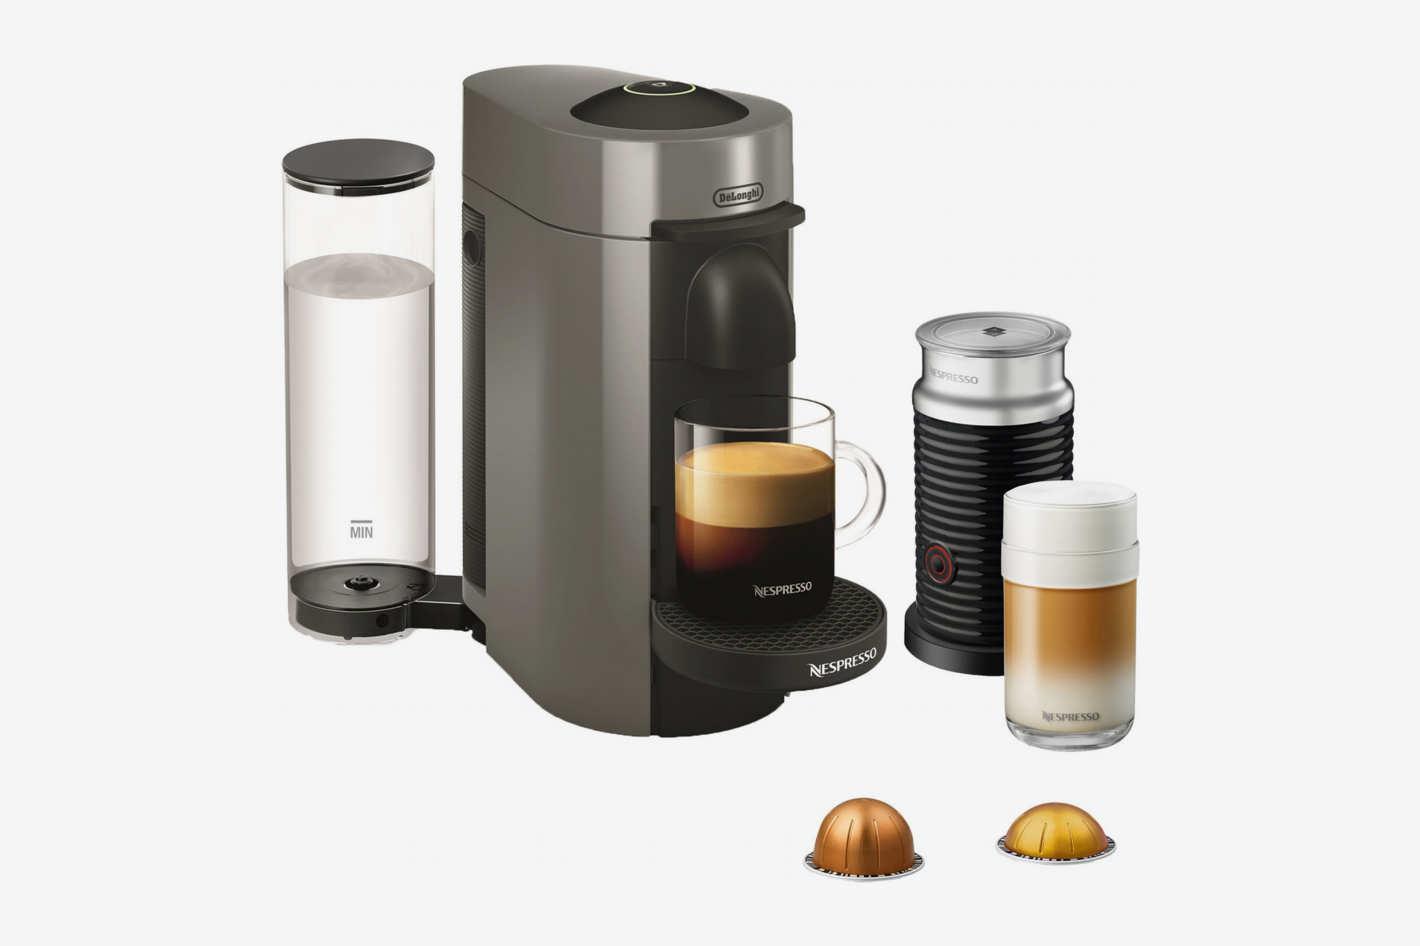 Nespresso VertuoPlus Coffee and Espresso Maker Bundle with Aeroccino Milk Frother by De'Longhi